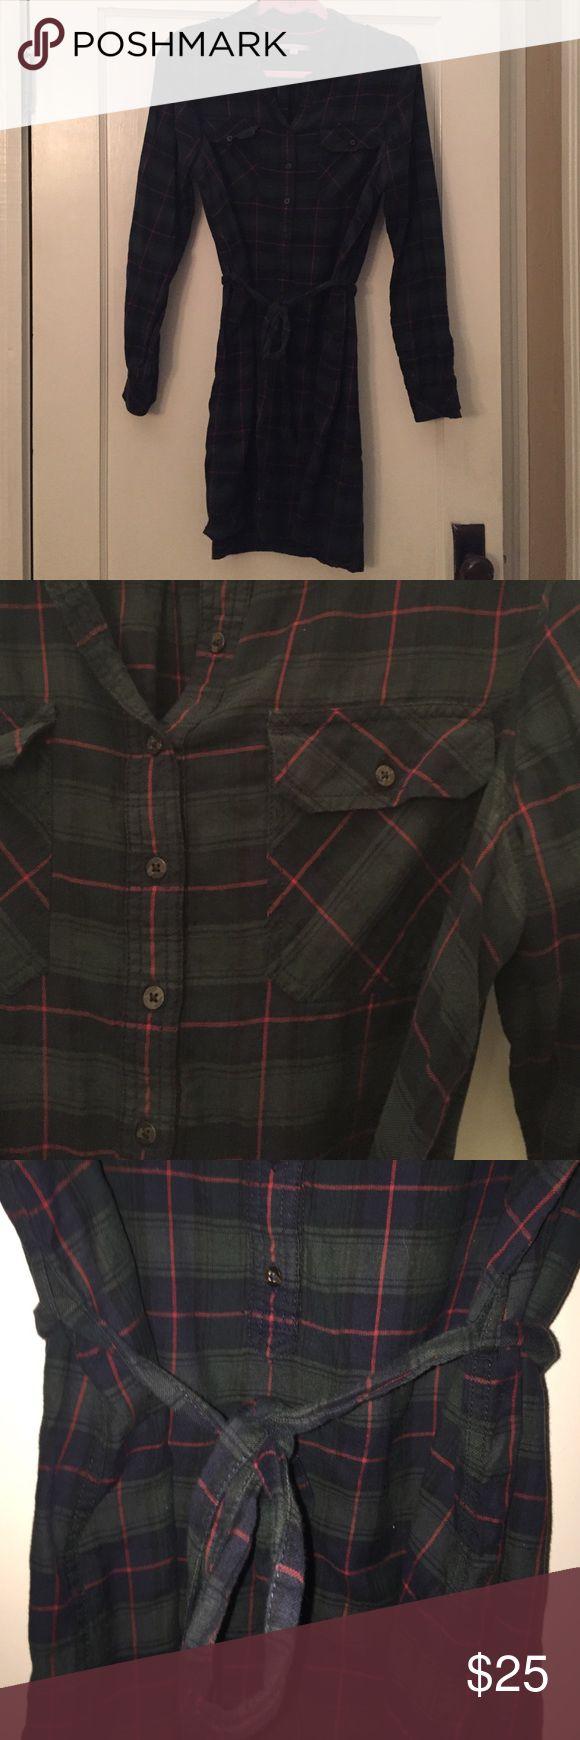 Gap flannel shirt dress Gap plaid flannel shirt dress GAP Dresses